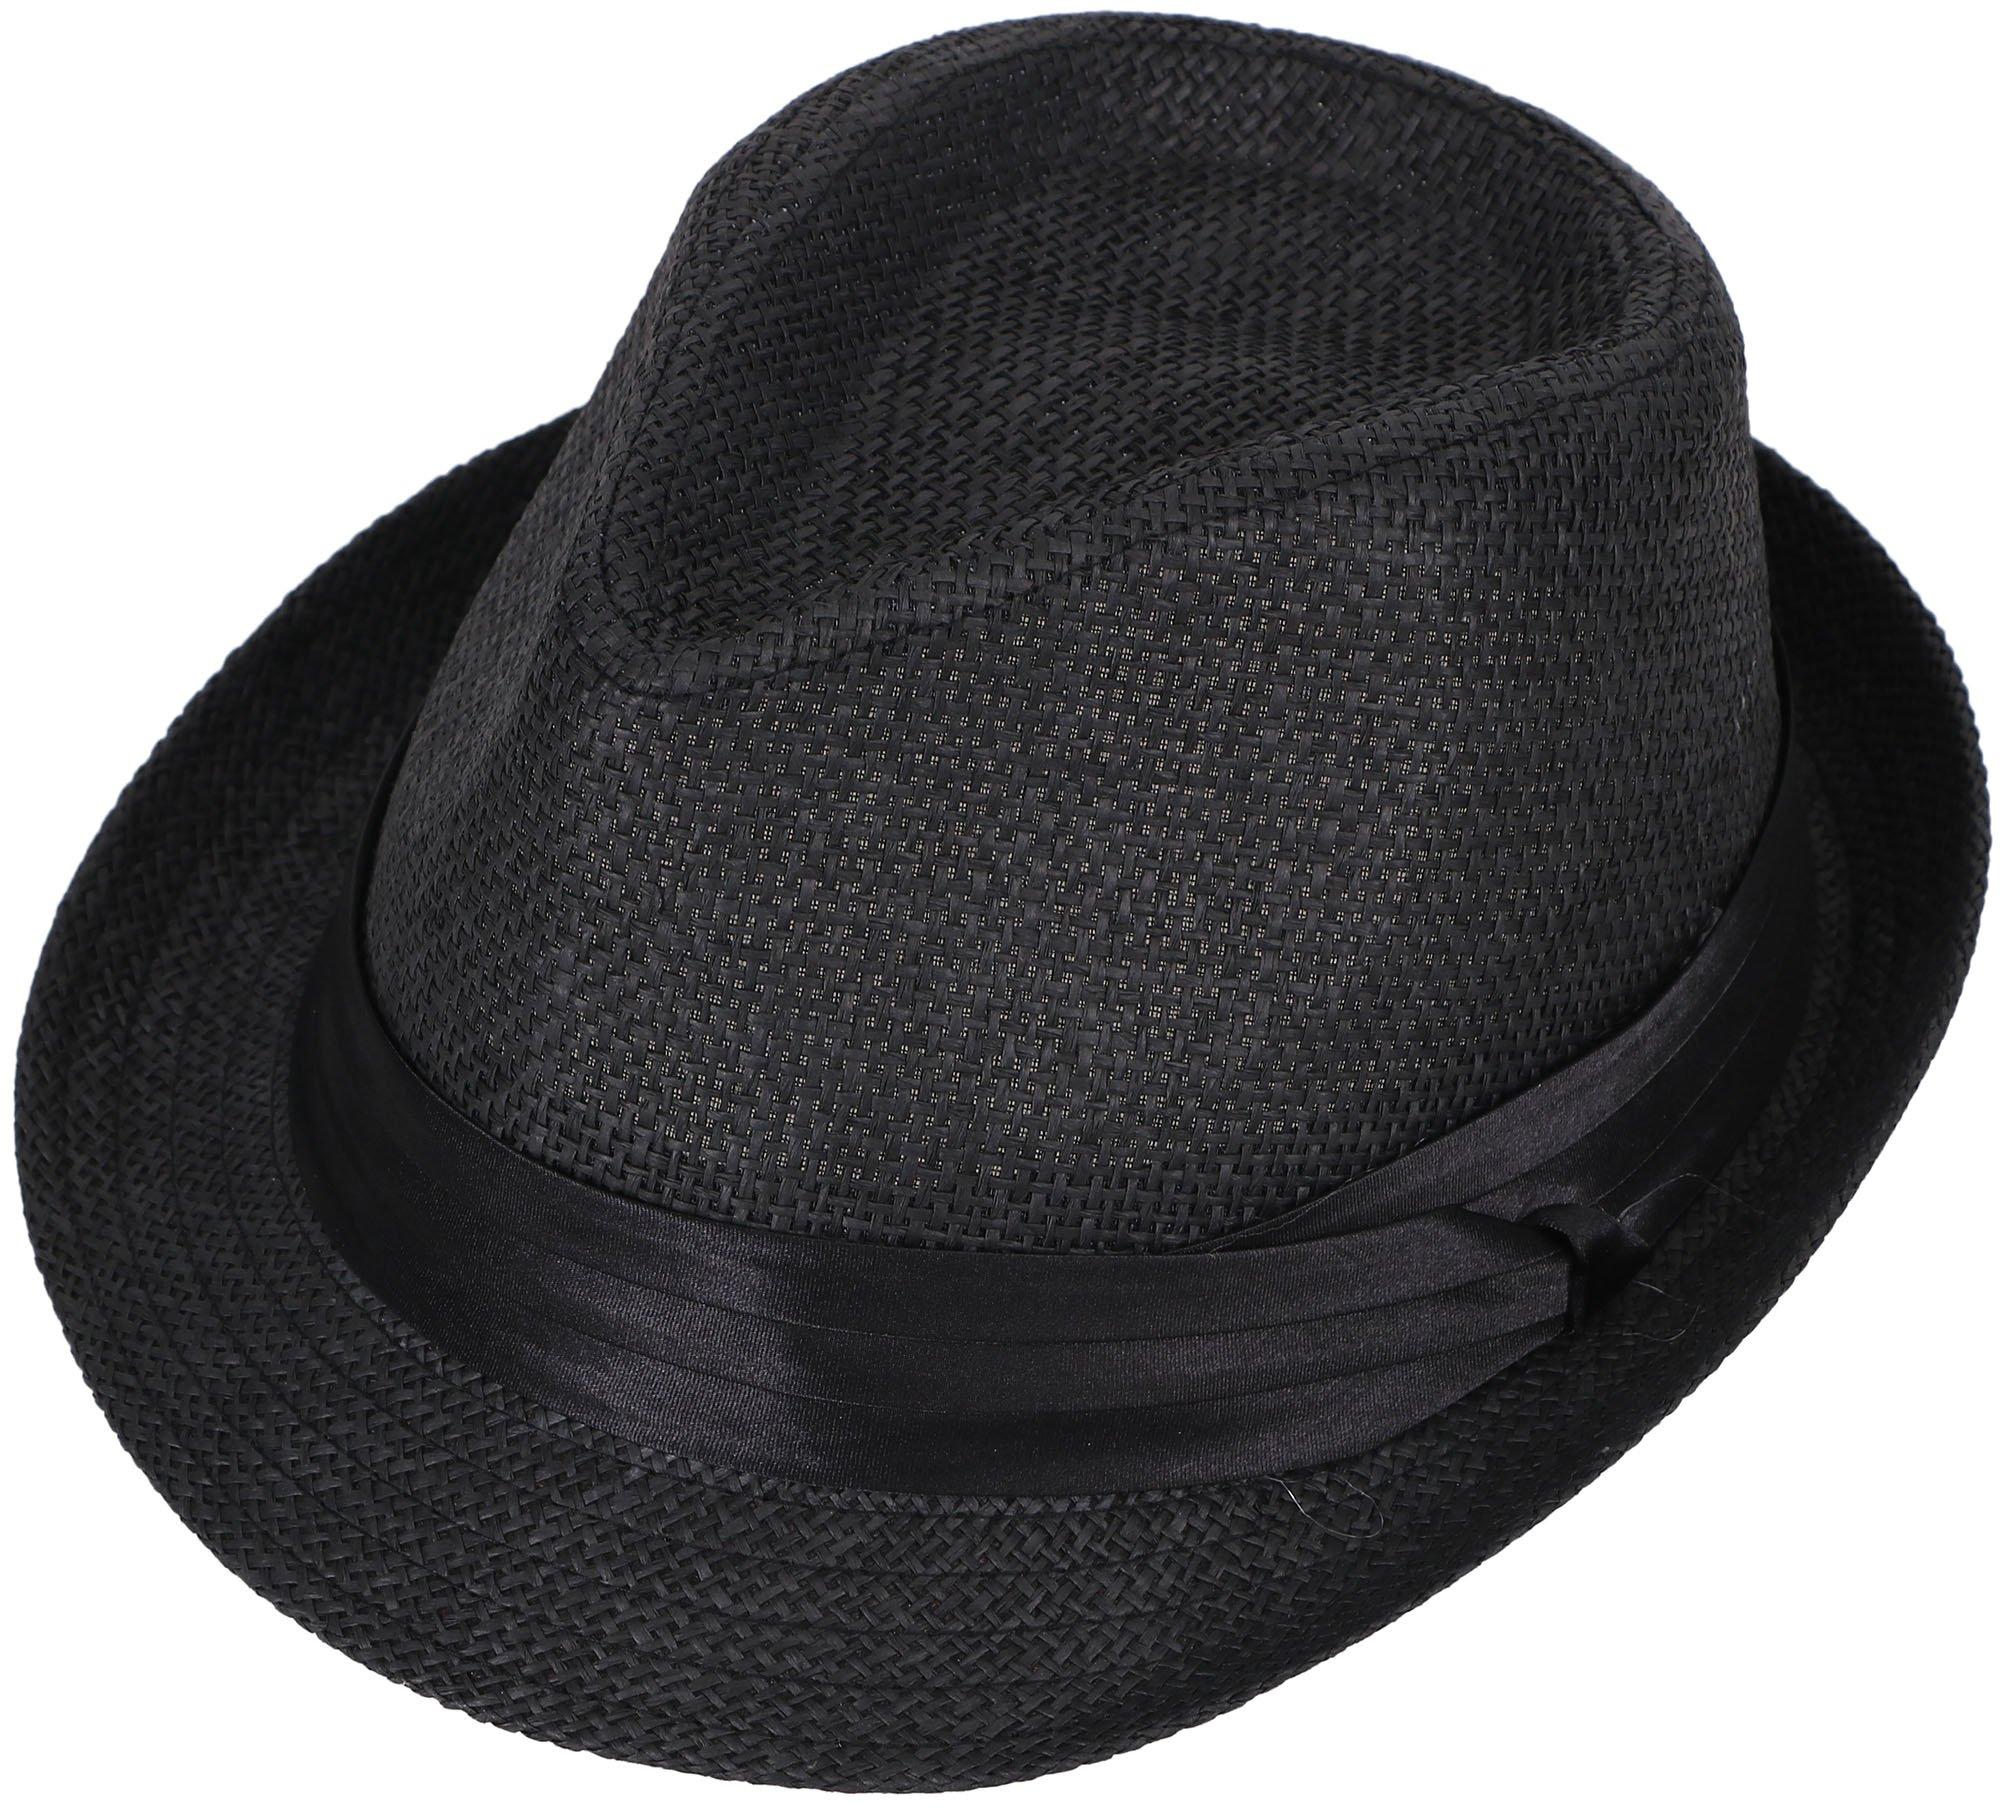 AbbyLexi Men's Straw Fedora Short Brim Summer Outdoors Sun Hat, Black, S/M